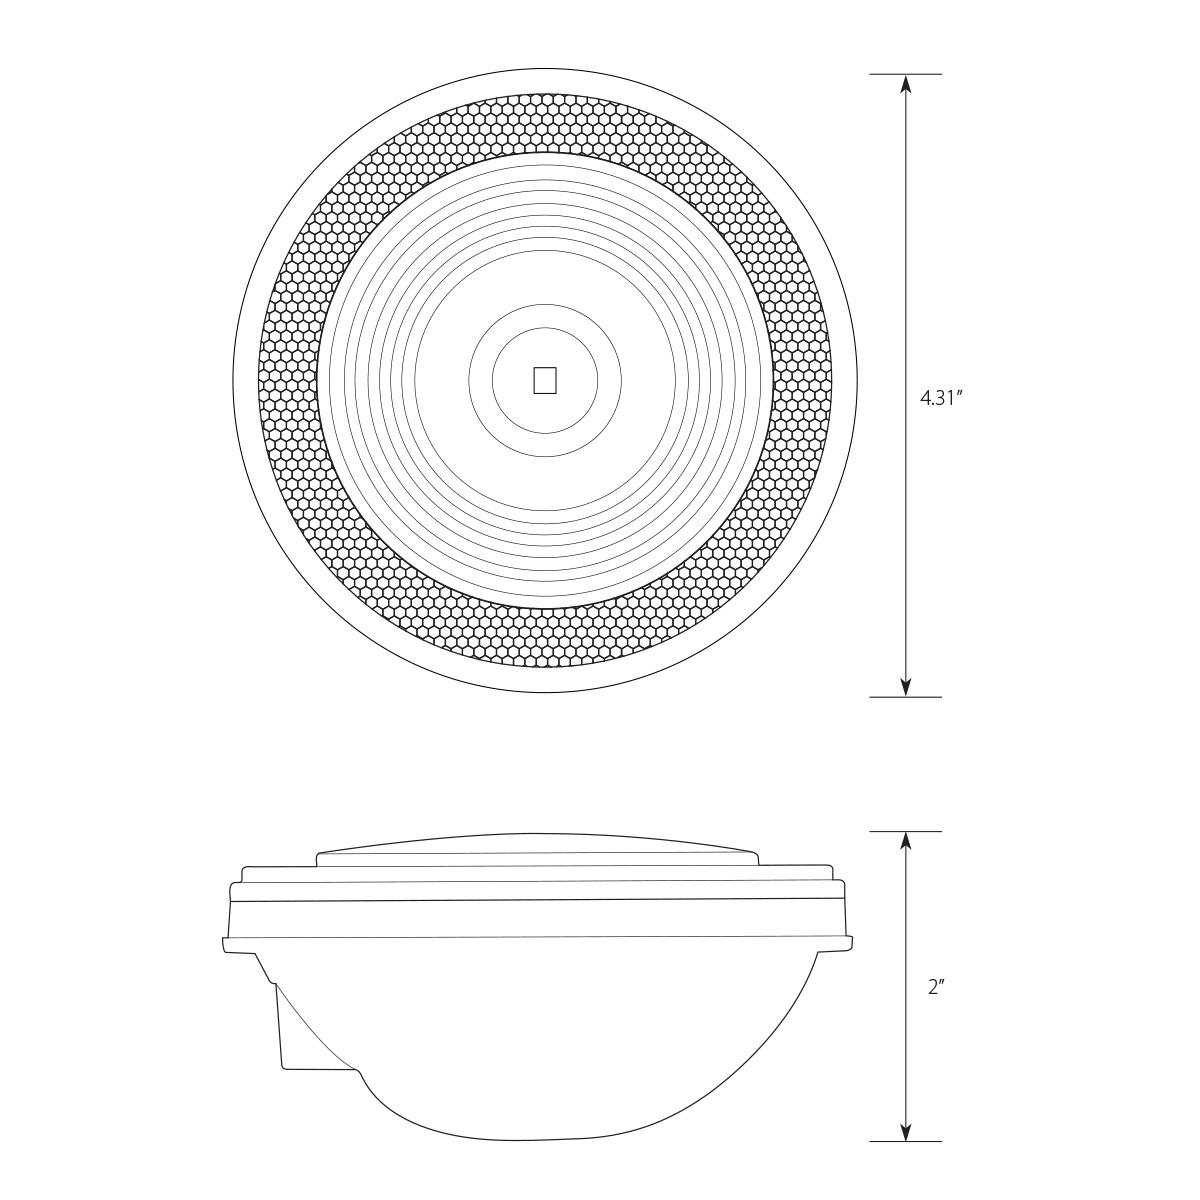 4 Single Led W Reflective Ring Lens